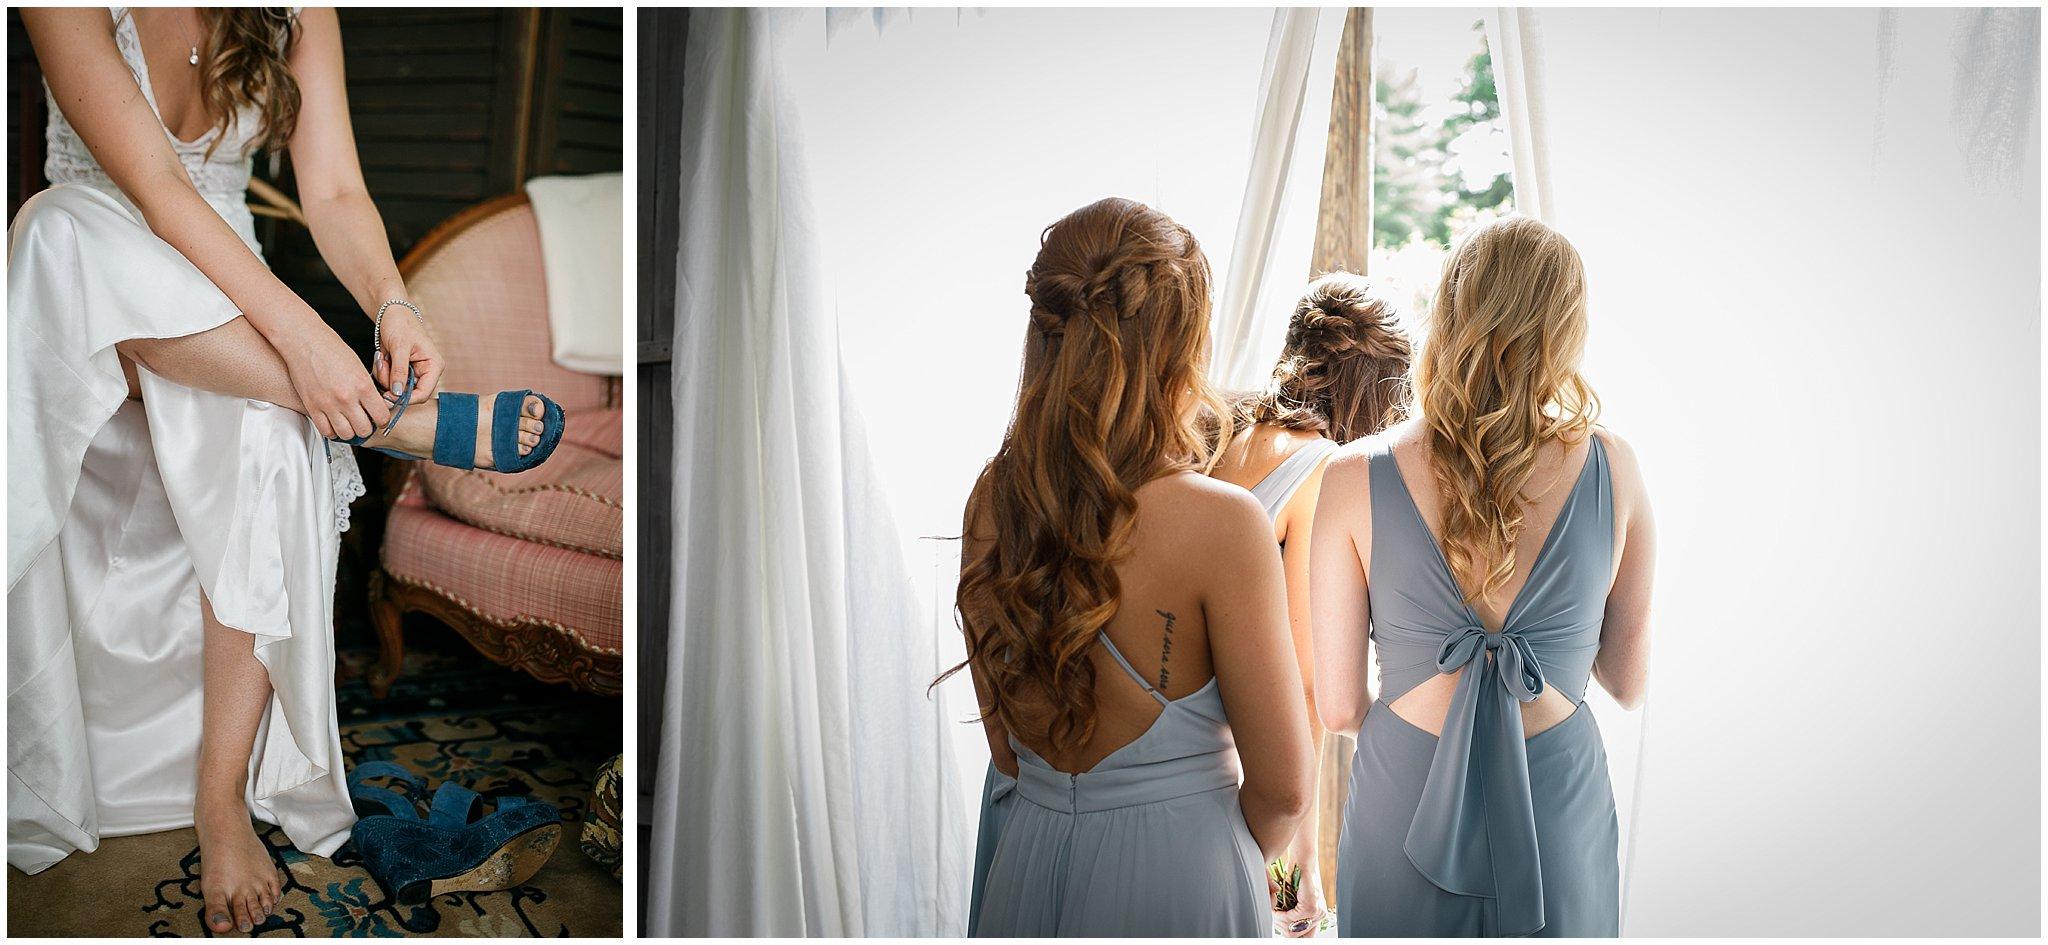 Hudson Valley Weddings at the Hill Hudson New York Wedding Photographer29.jpg